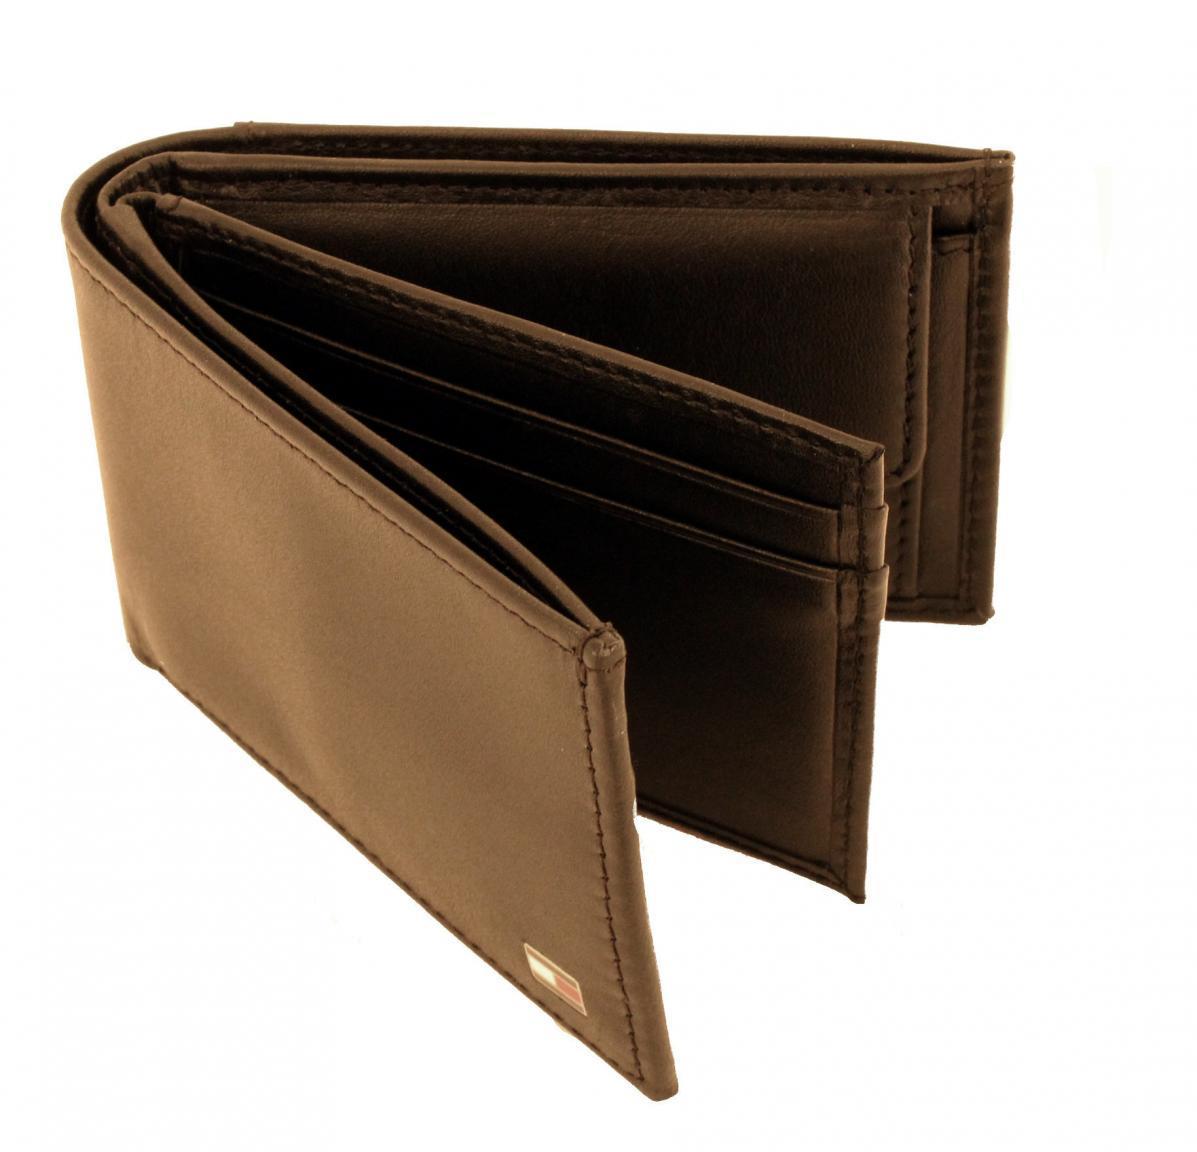 08bc8b4c051f2 Tommy Hilfiger Eton Mini Portmonee klein quer schwarz - Bags   more